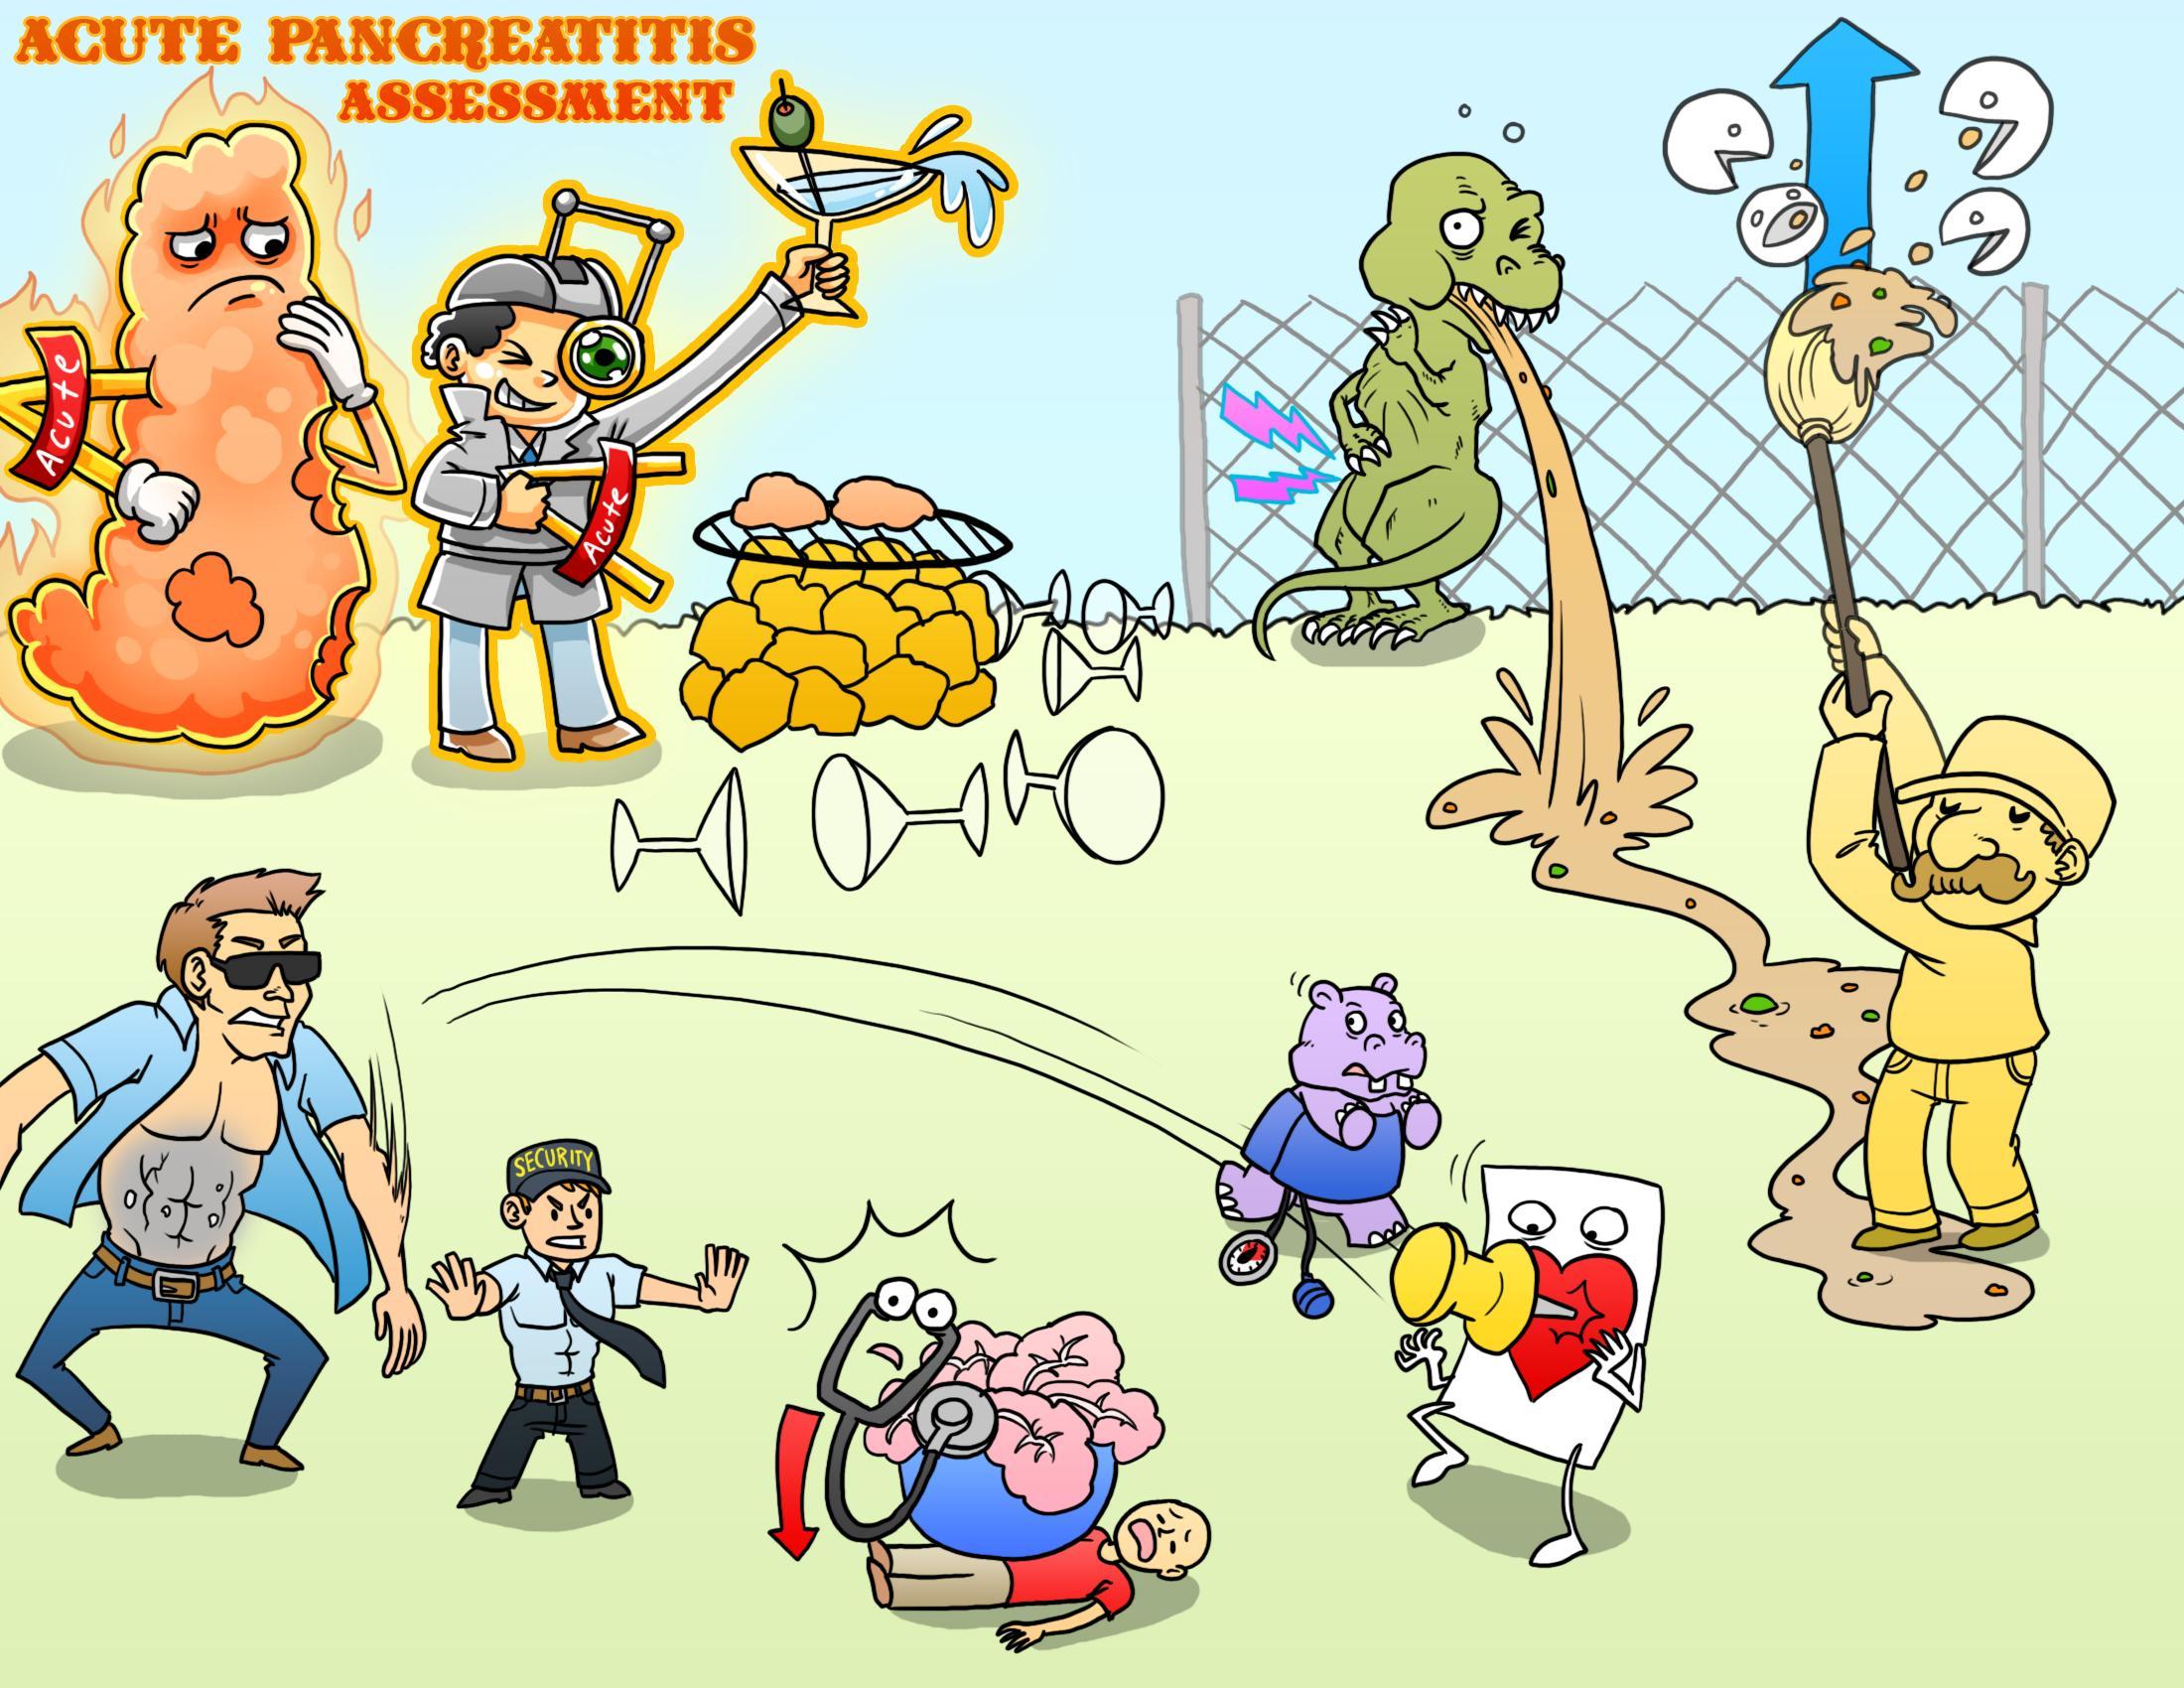 Acute Pancreatitis Assessment